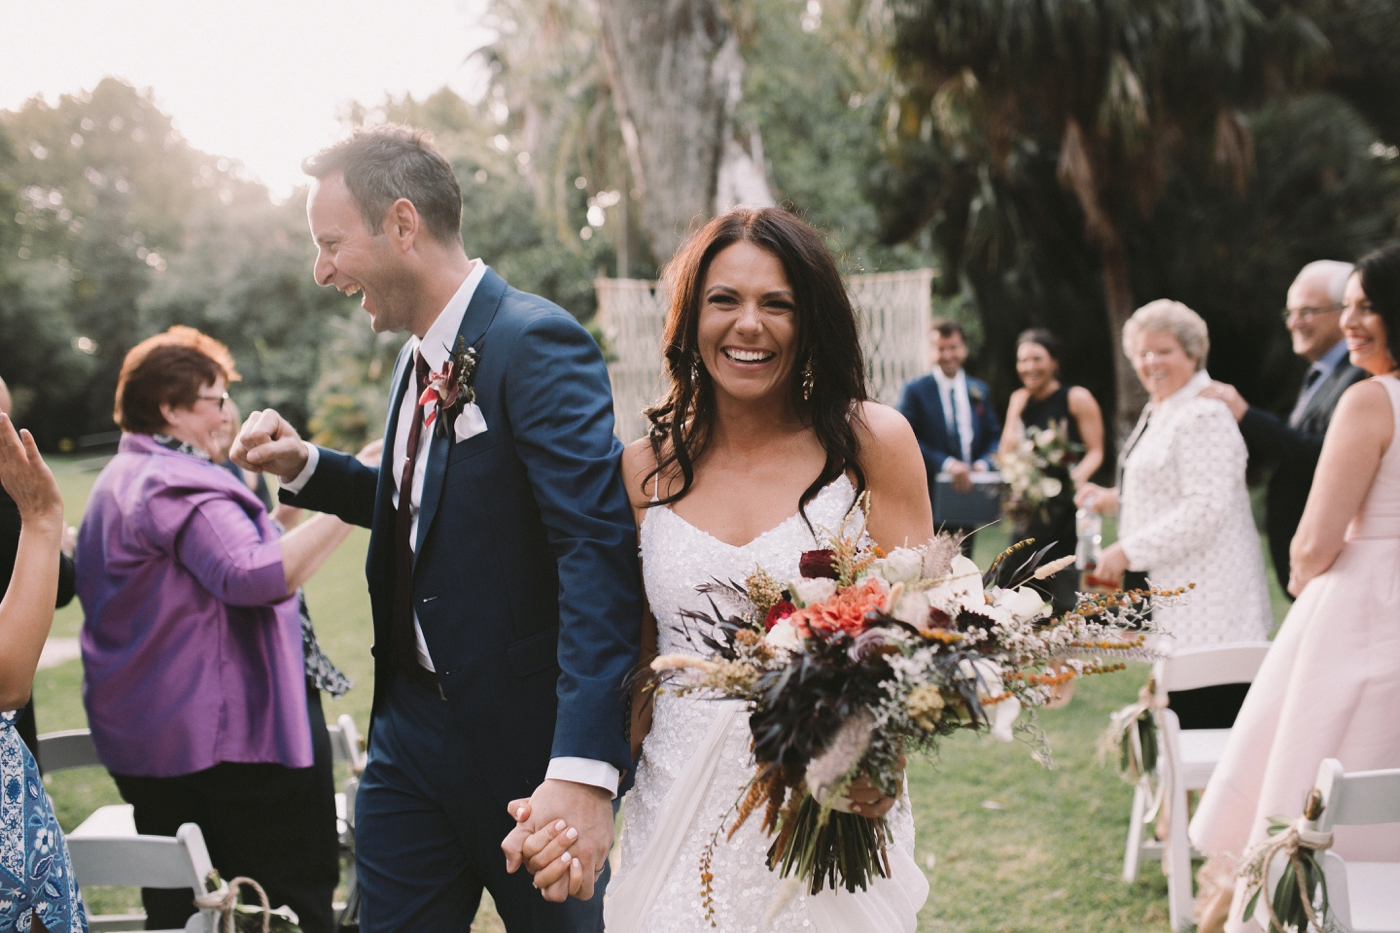 Kellie & Brent - Adelaide City Wedding - Natural wedding photography in Adelaide - Katherine Schultz - www.katherineschultzphotography.com 47